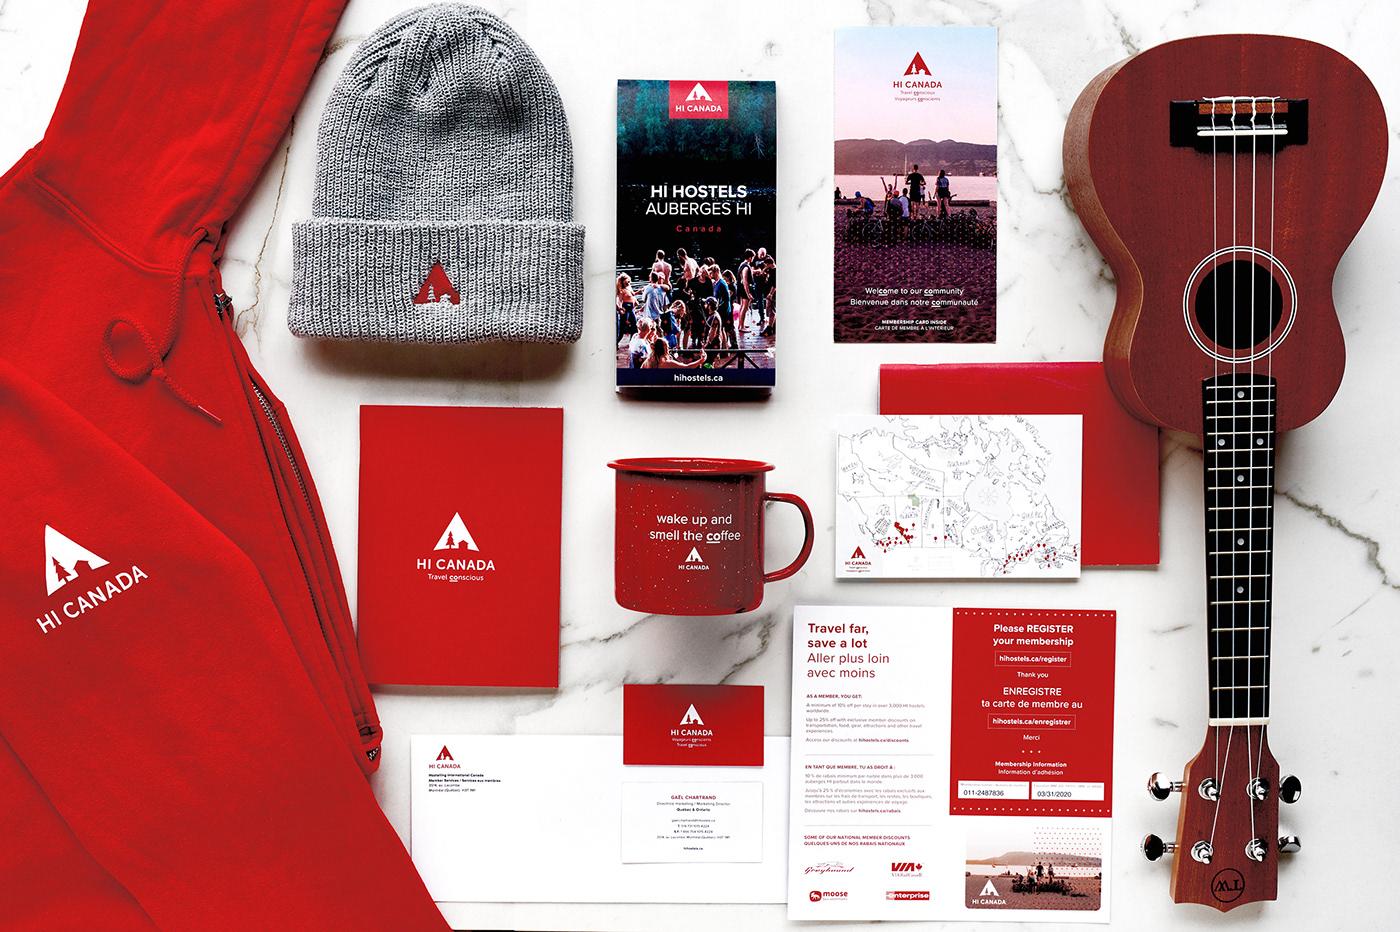 adventure apparel art direction  brand graphic design  Guide hostel map Promotional Travel